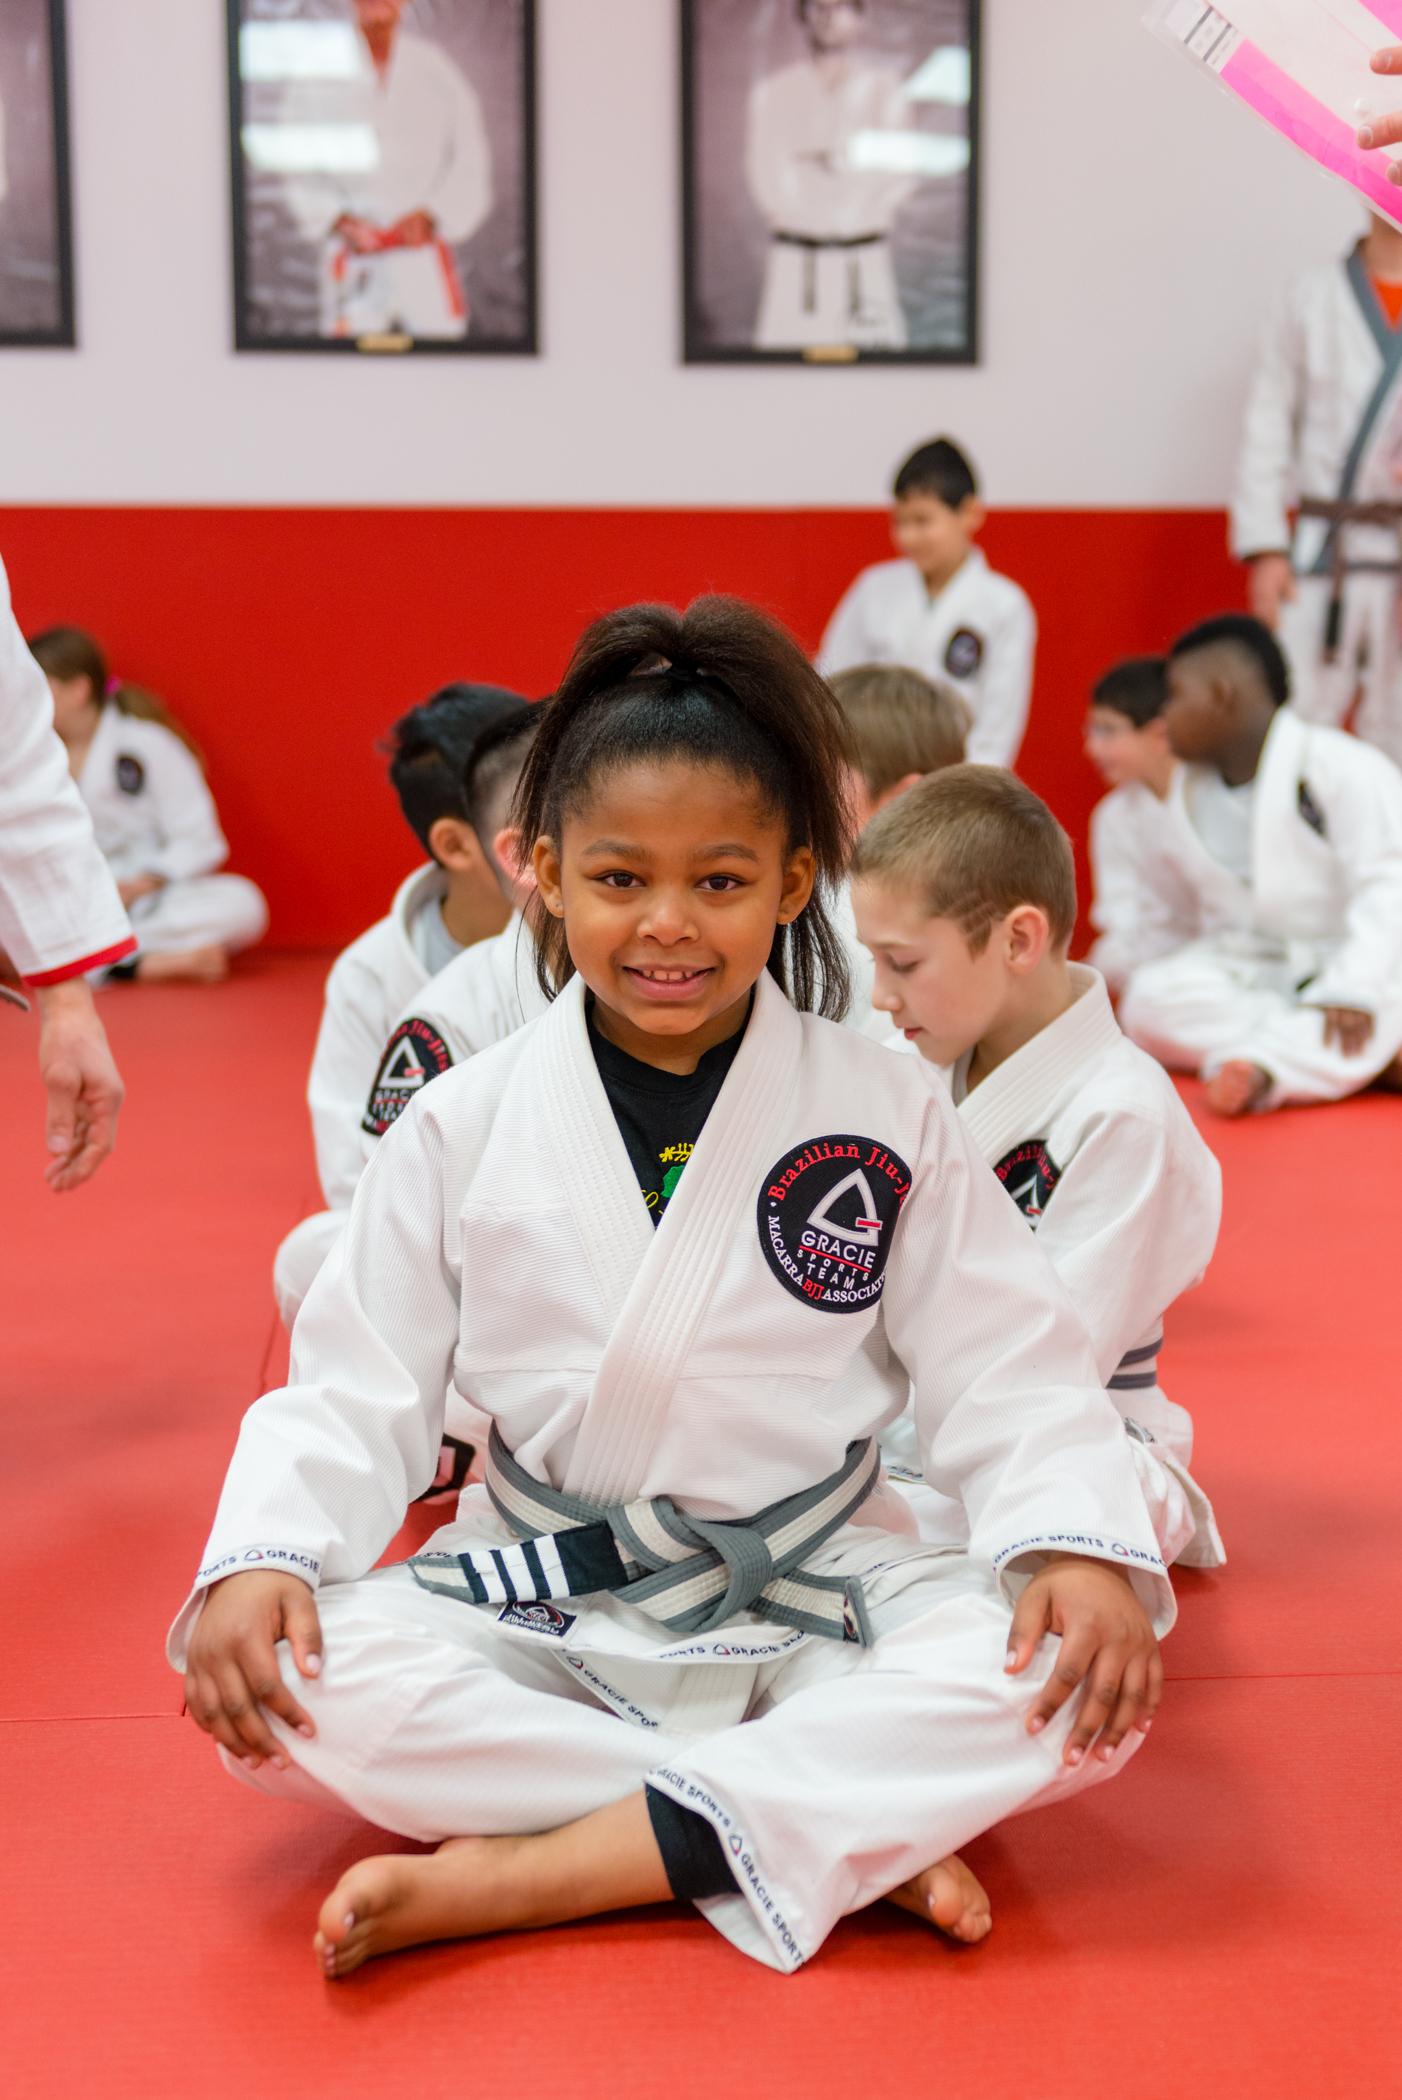 Gracie-Sports-Kids-2.jpg